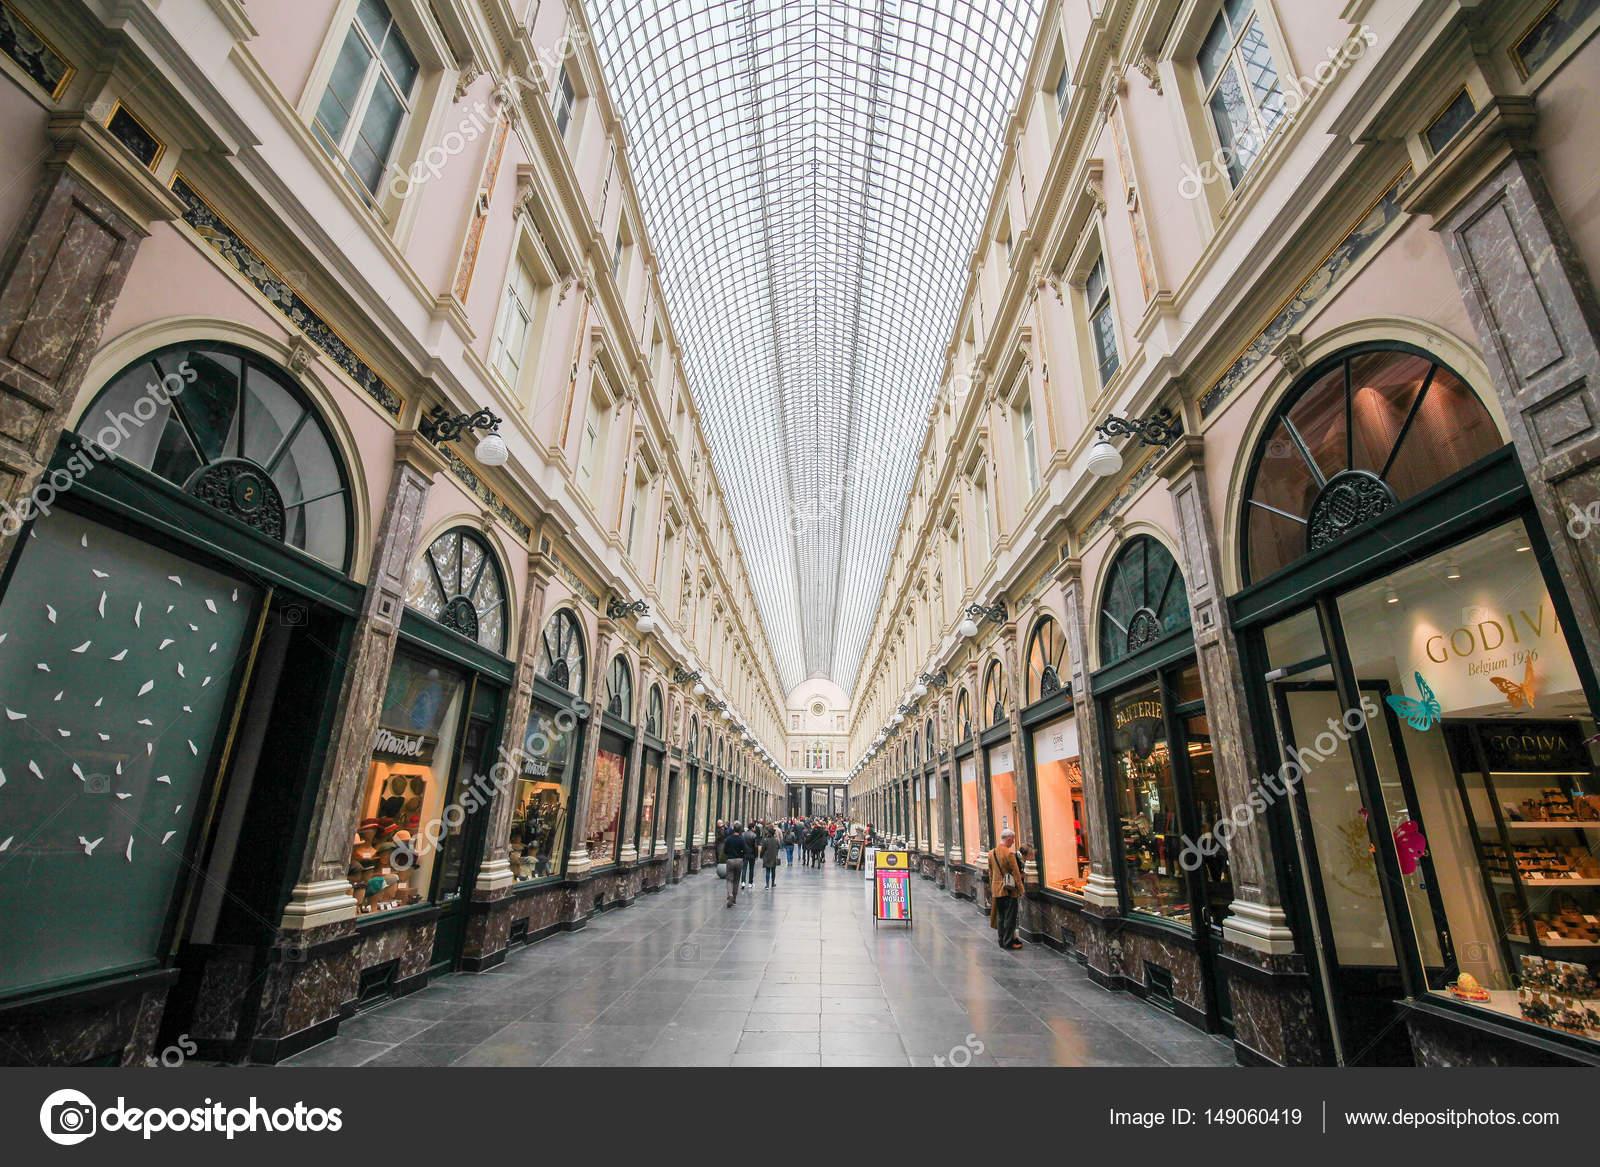 ff8b0330fbee4 The Galeries Royales Saint-Hubert (French) or Koninklijke  Sint-Hubertusgalerijen (Dutch) is a glazed shopping arcade in Brussels